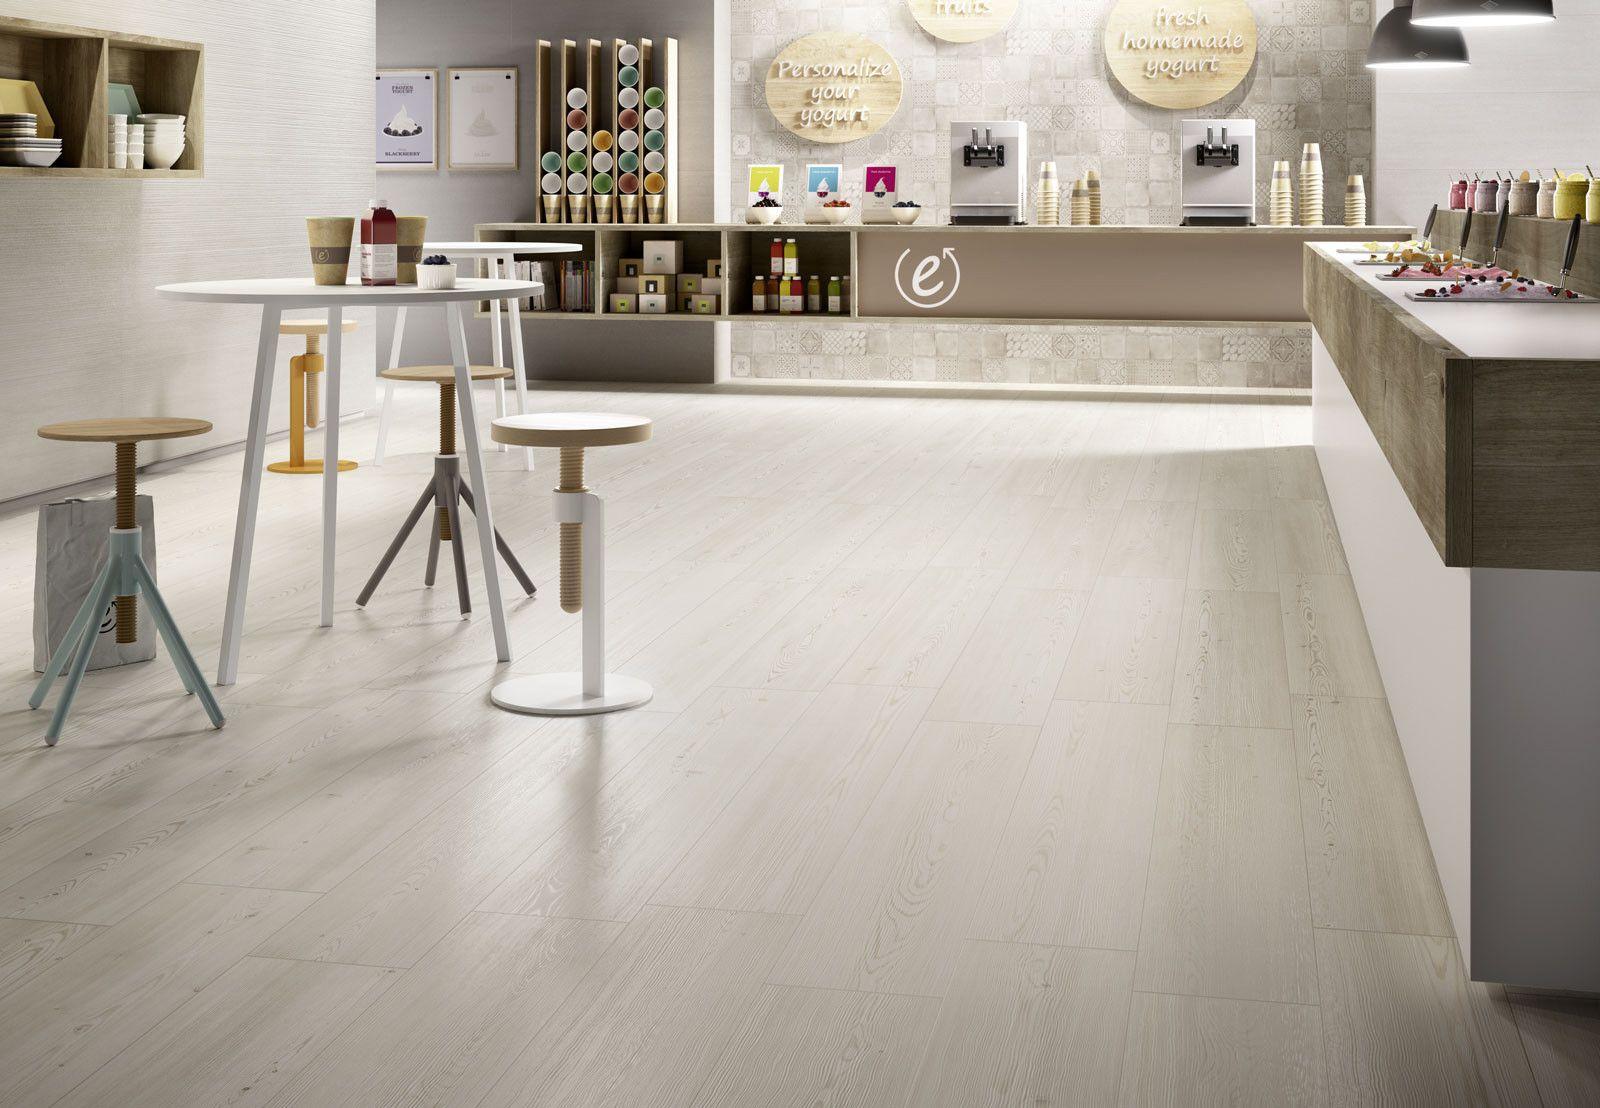 Küche Holzoptik | Marazzi Treverktrend Larice Perla 25x150 Cm Mmj9 Feinsteinzeug